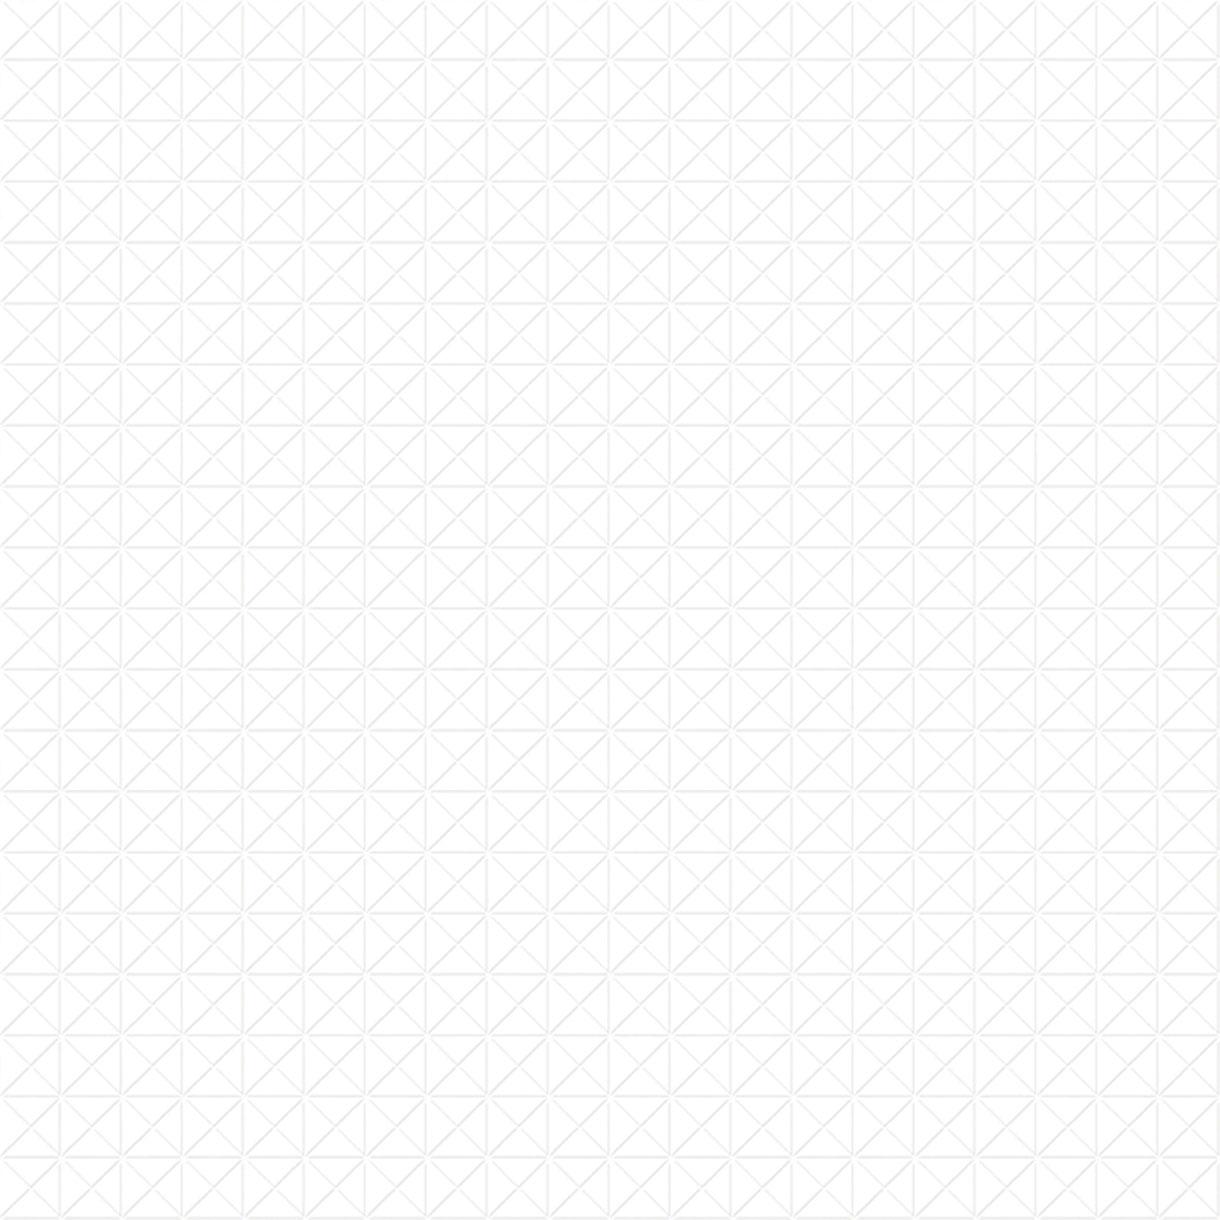 Настенная плитка Ceramique Imperiale Замоскворечье белый (00-00-1-14-00-00-280) 20х20 (1) замоскворечье